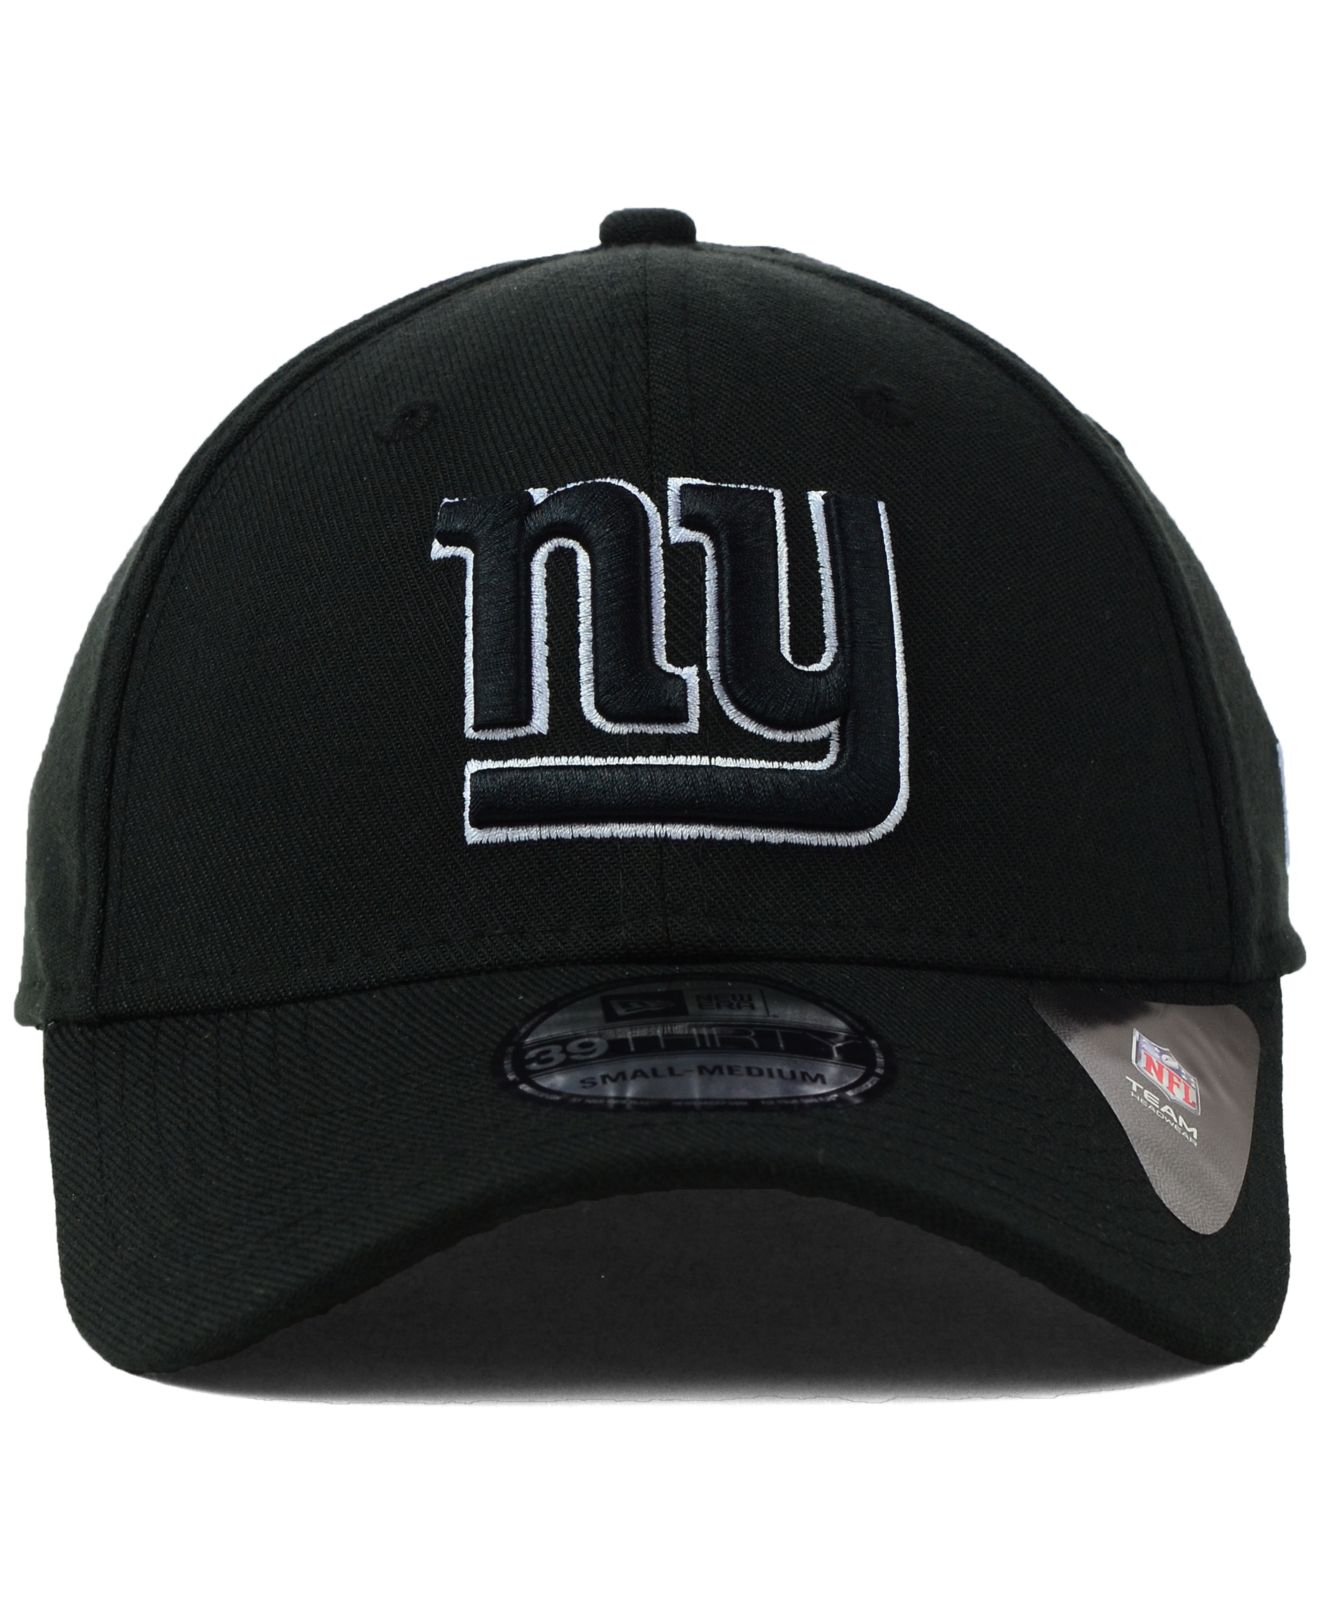 78aa1c86dd2 ... australia lyst ktz new york giants classic 39thirty cap in black for  men 581ee 1a171